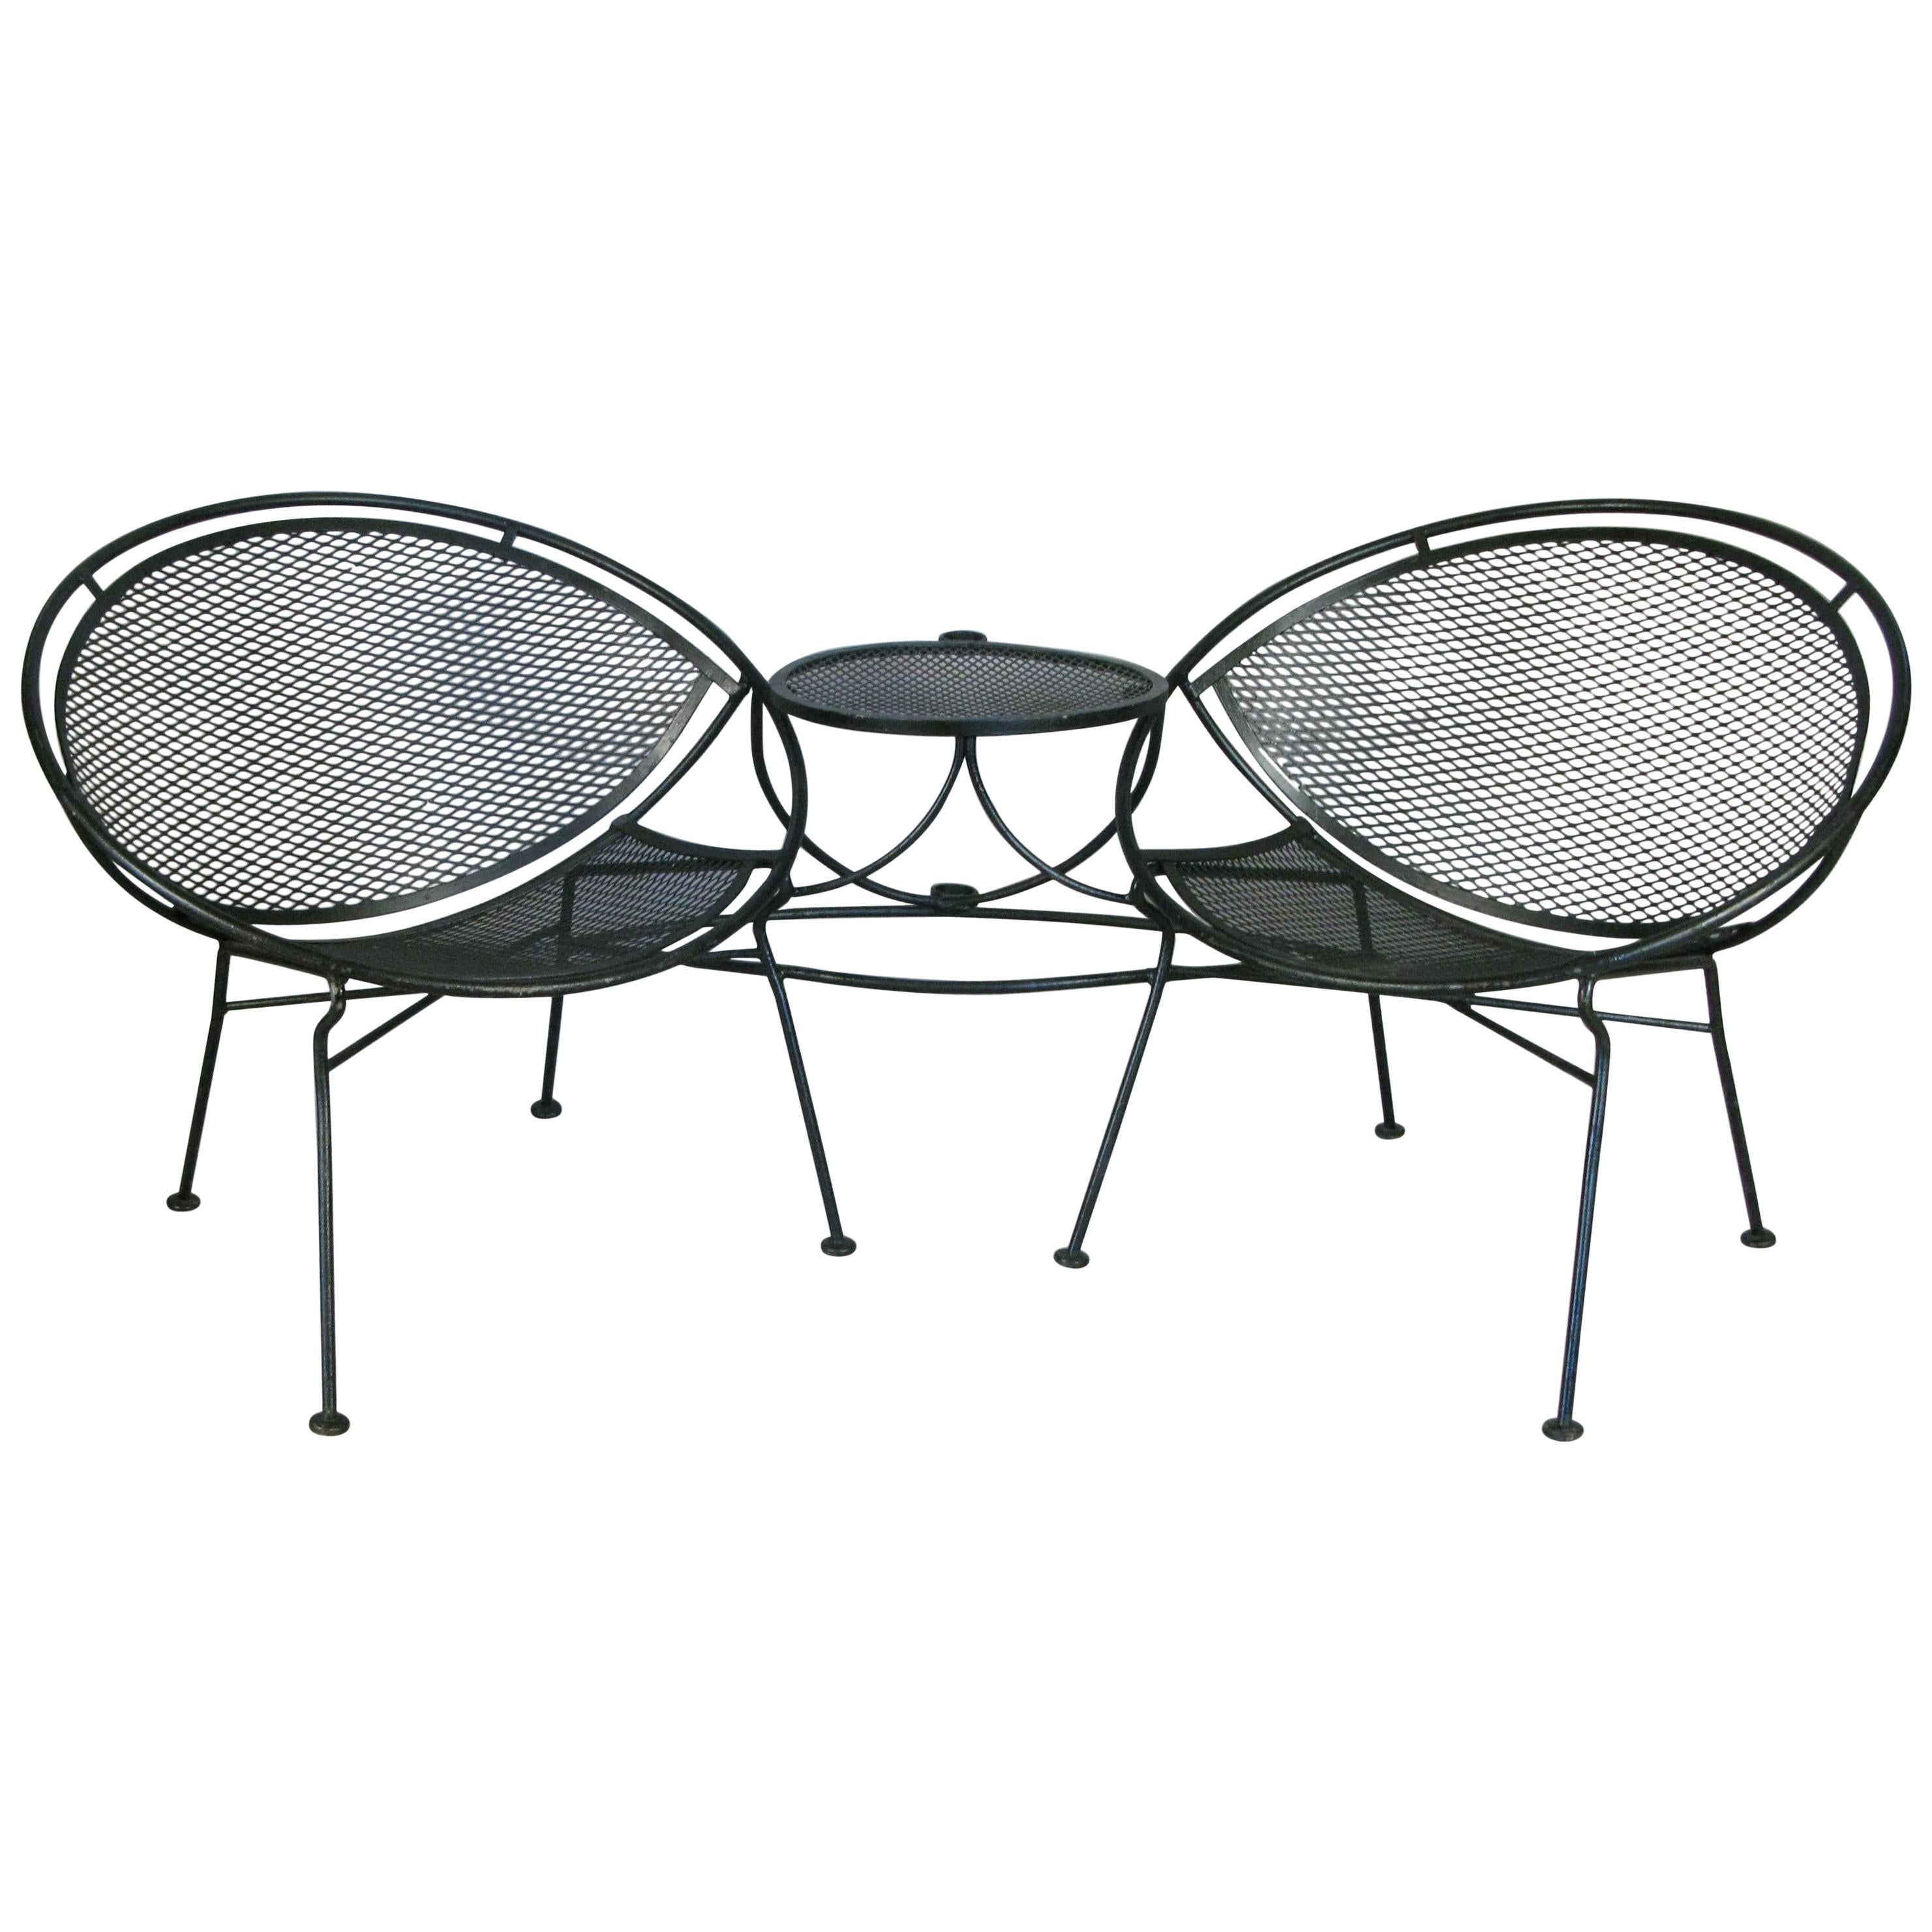 maurizio tempestini furniture 82 for sale at 1stdibs 1970s Office Furniture